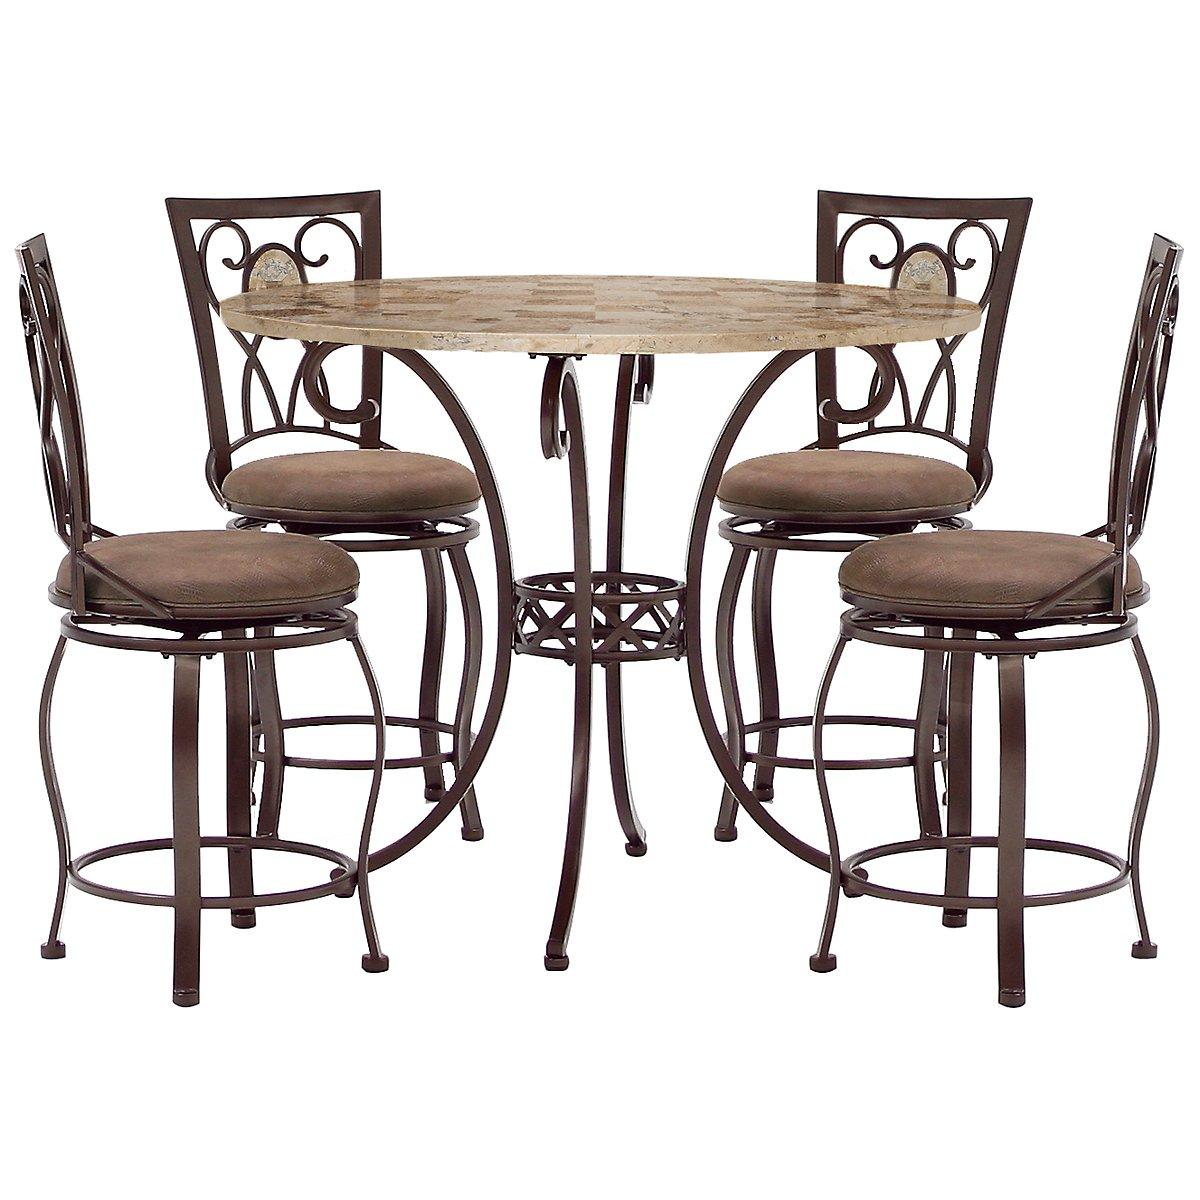 Brookside Round Stone High Table & 4 Barstools